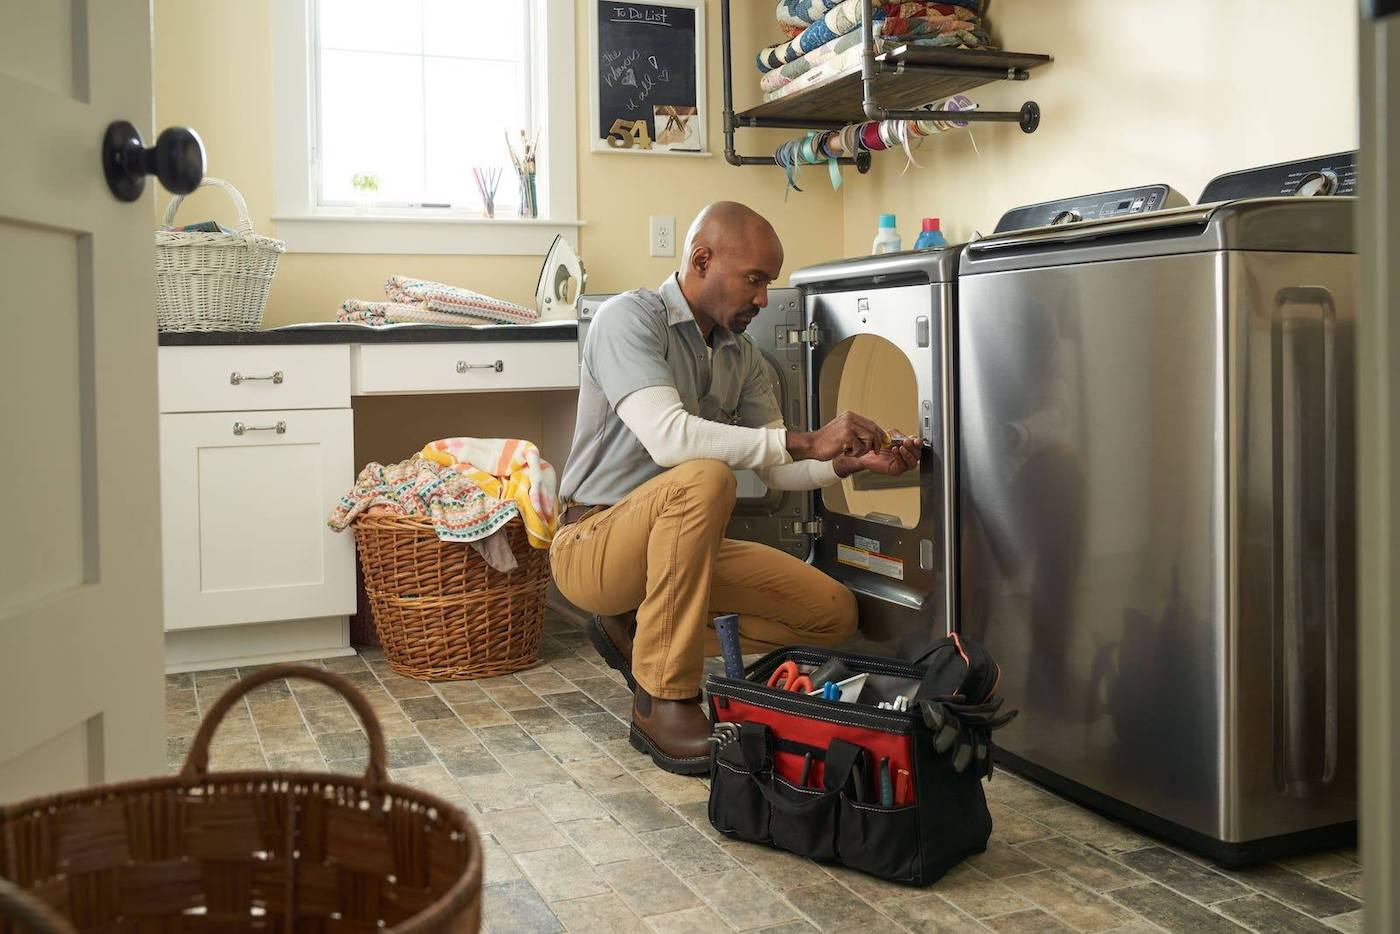 Appliance Repairman repairs dryer